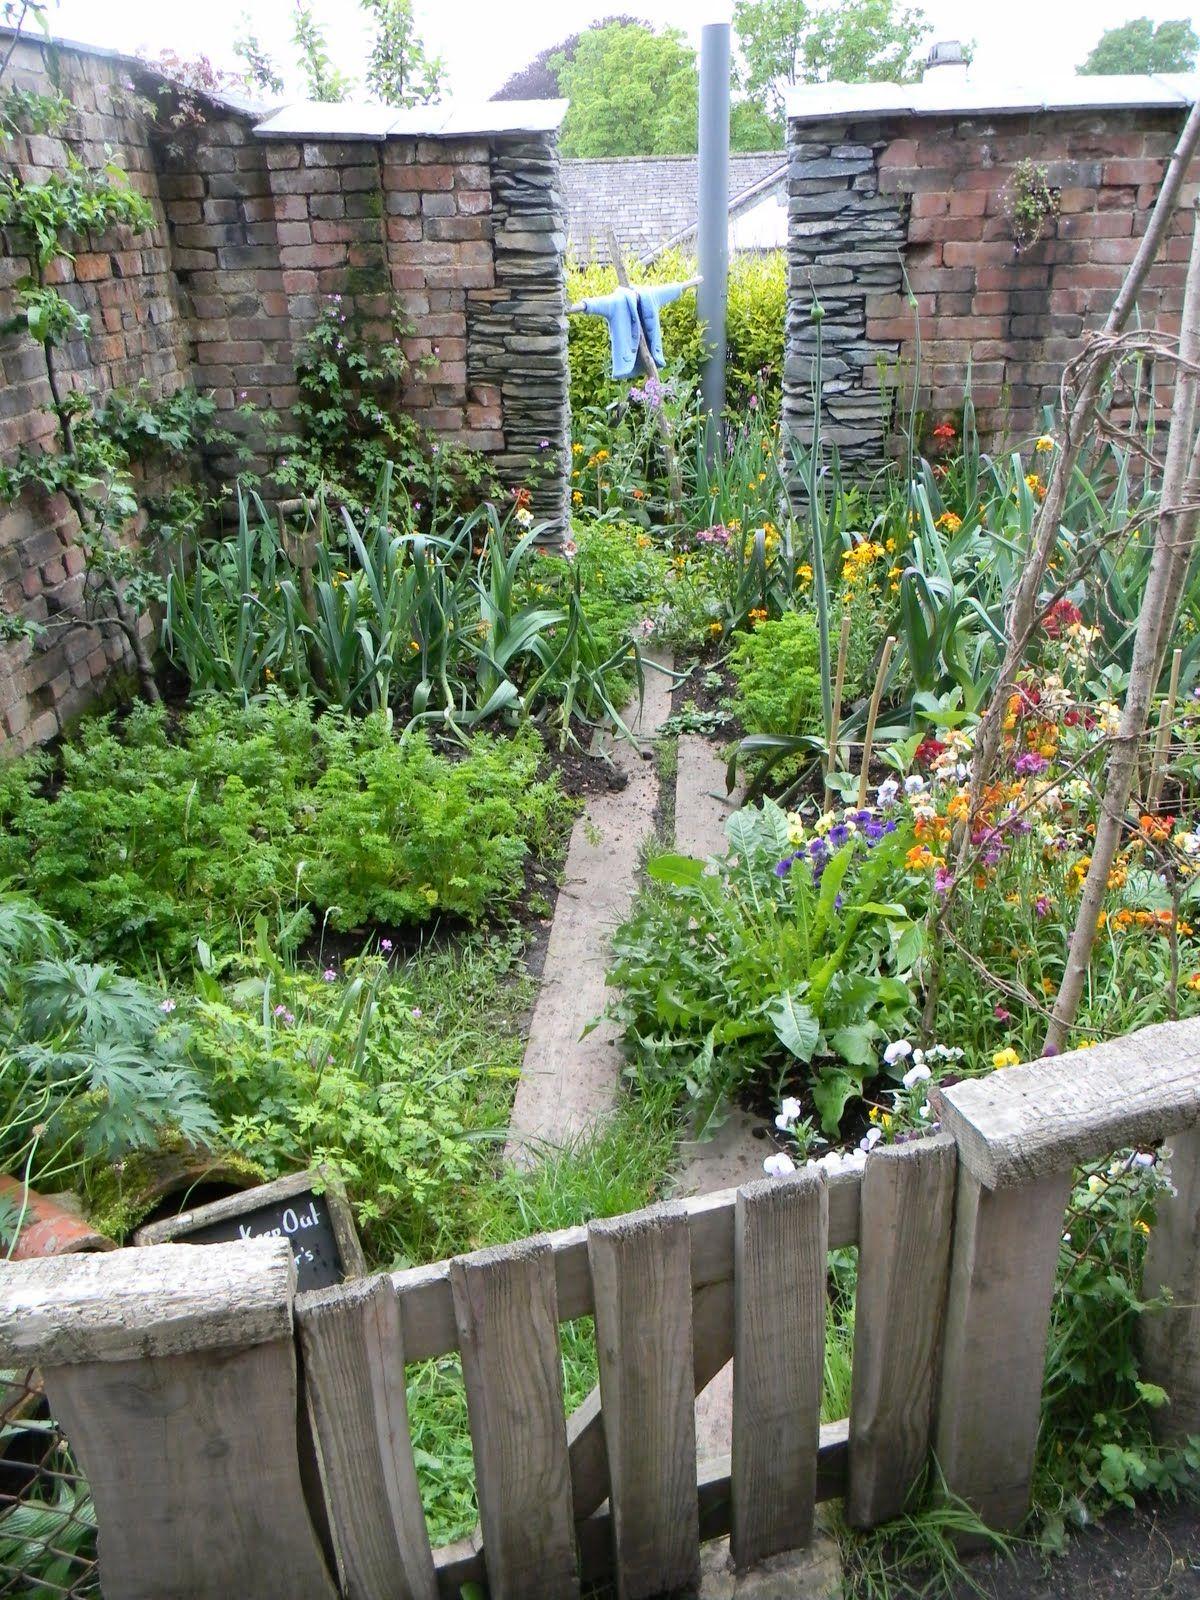 90b5b64951fca7bd088a8b864b704acc - Best Vegetable Gardens In The World